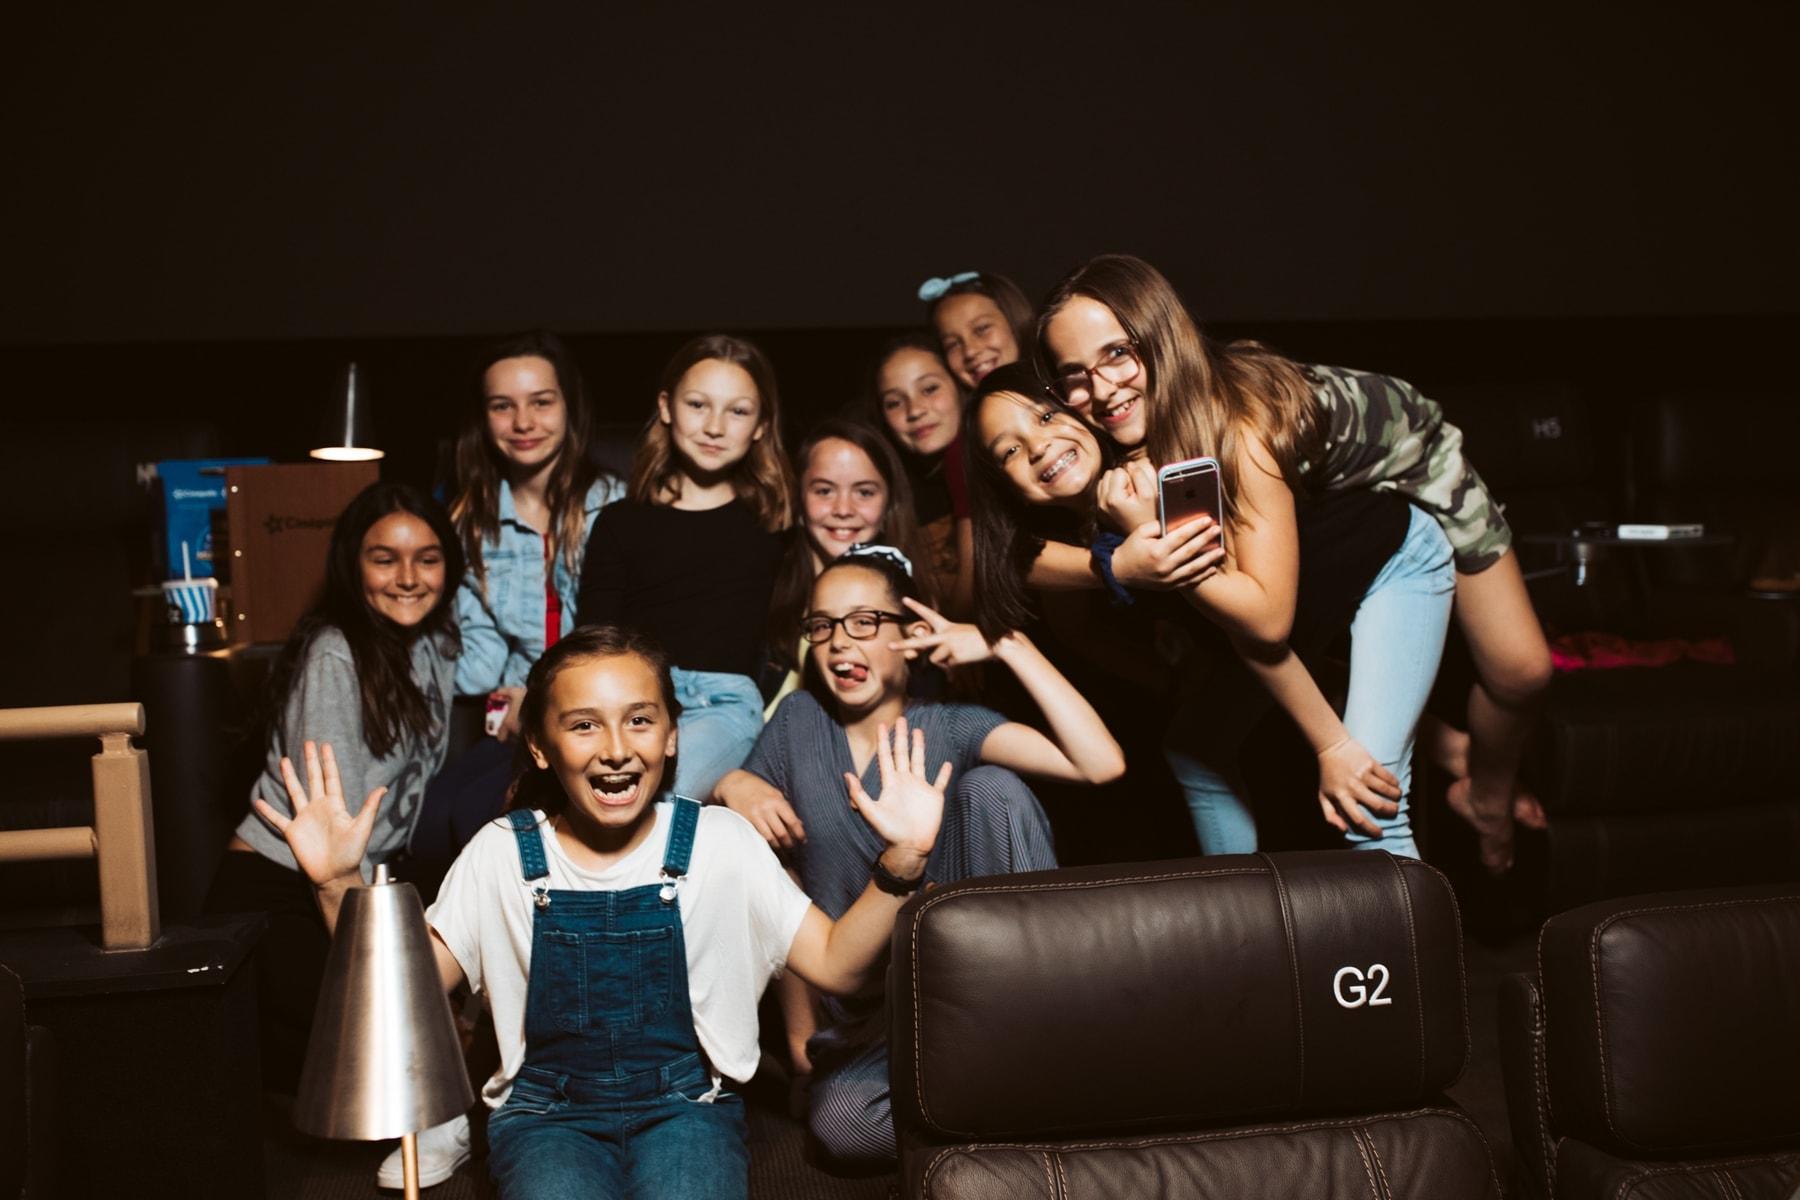 girls at movie theater